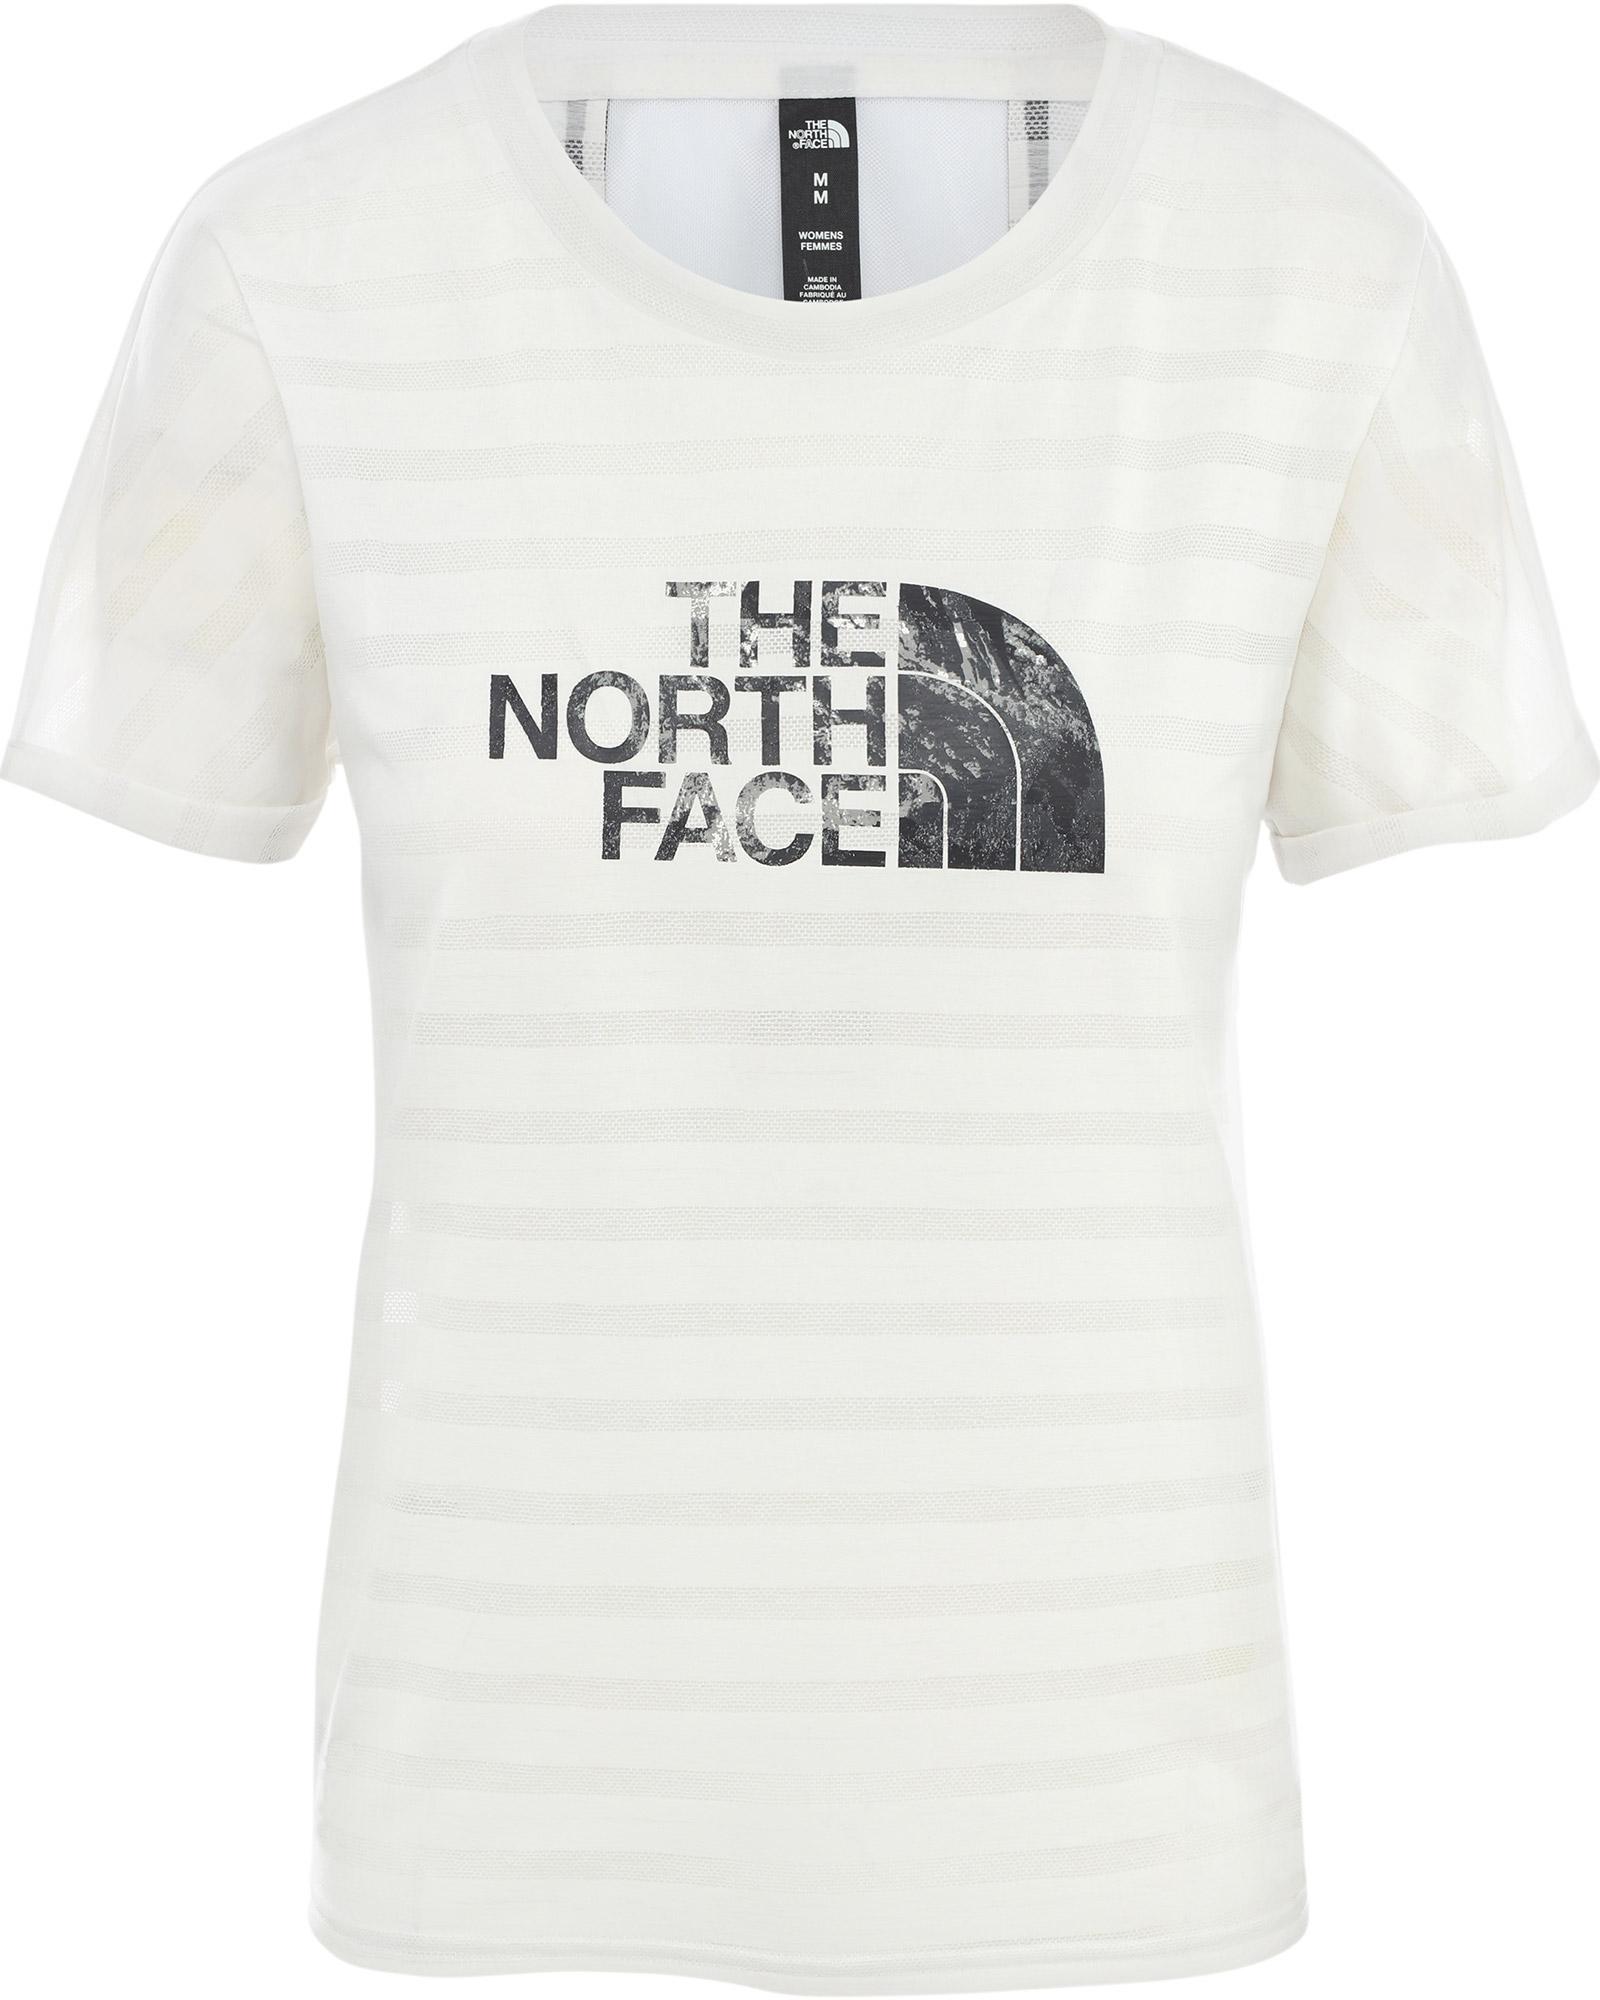 The North Face Women's Varuna T-Shirt 0